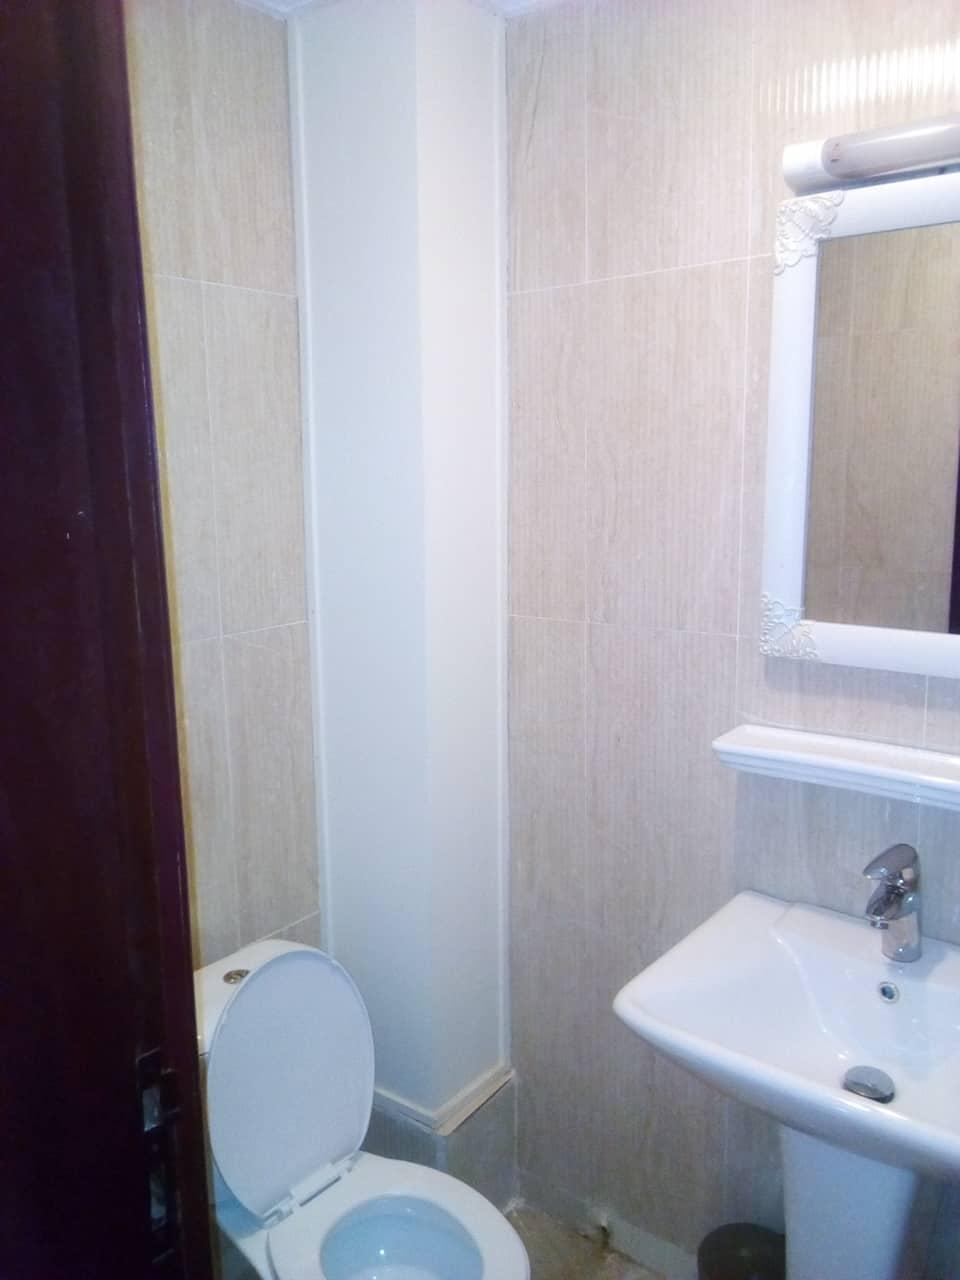 Apartment to rent - Yaoundé, Bastos, vers banque mondiale - 1 living room(s), 2 bedroom(s), 3 bathroom(s) - 1 500 000 FCFA / month